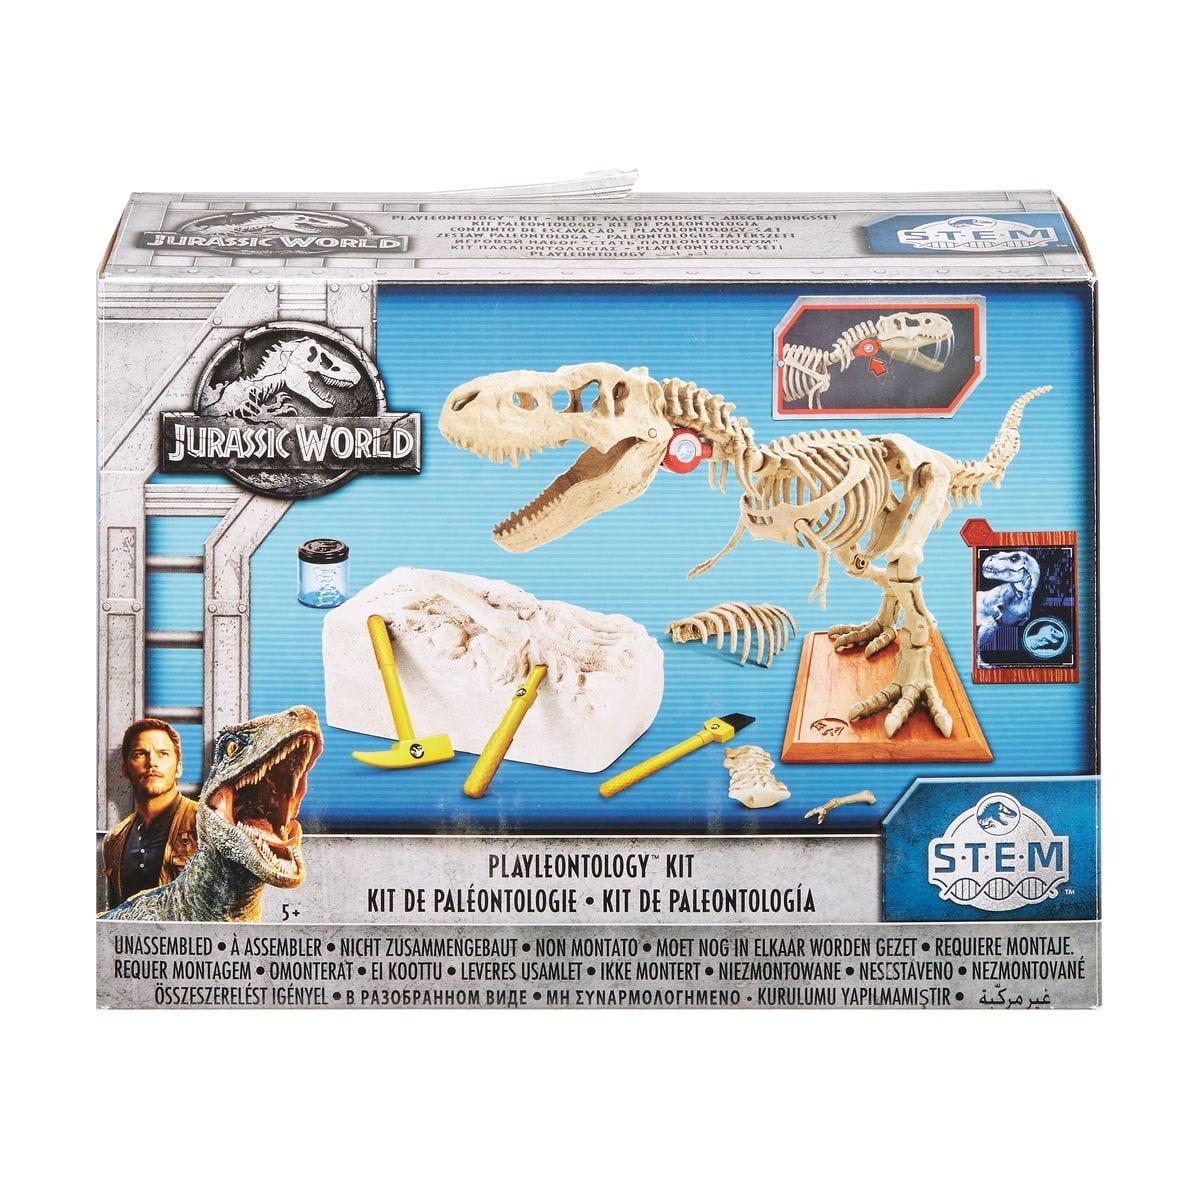 Jurassic World Excavation Set